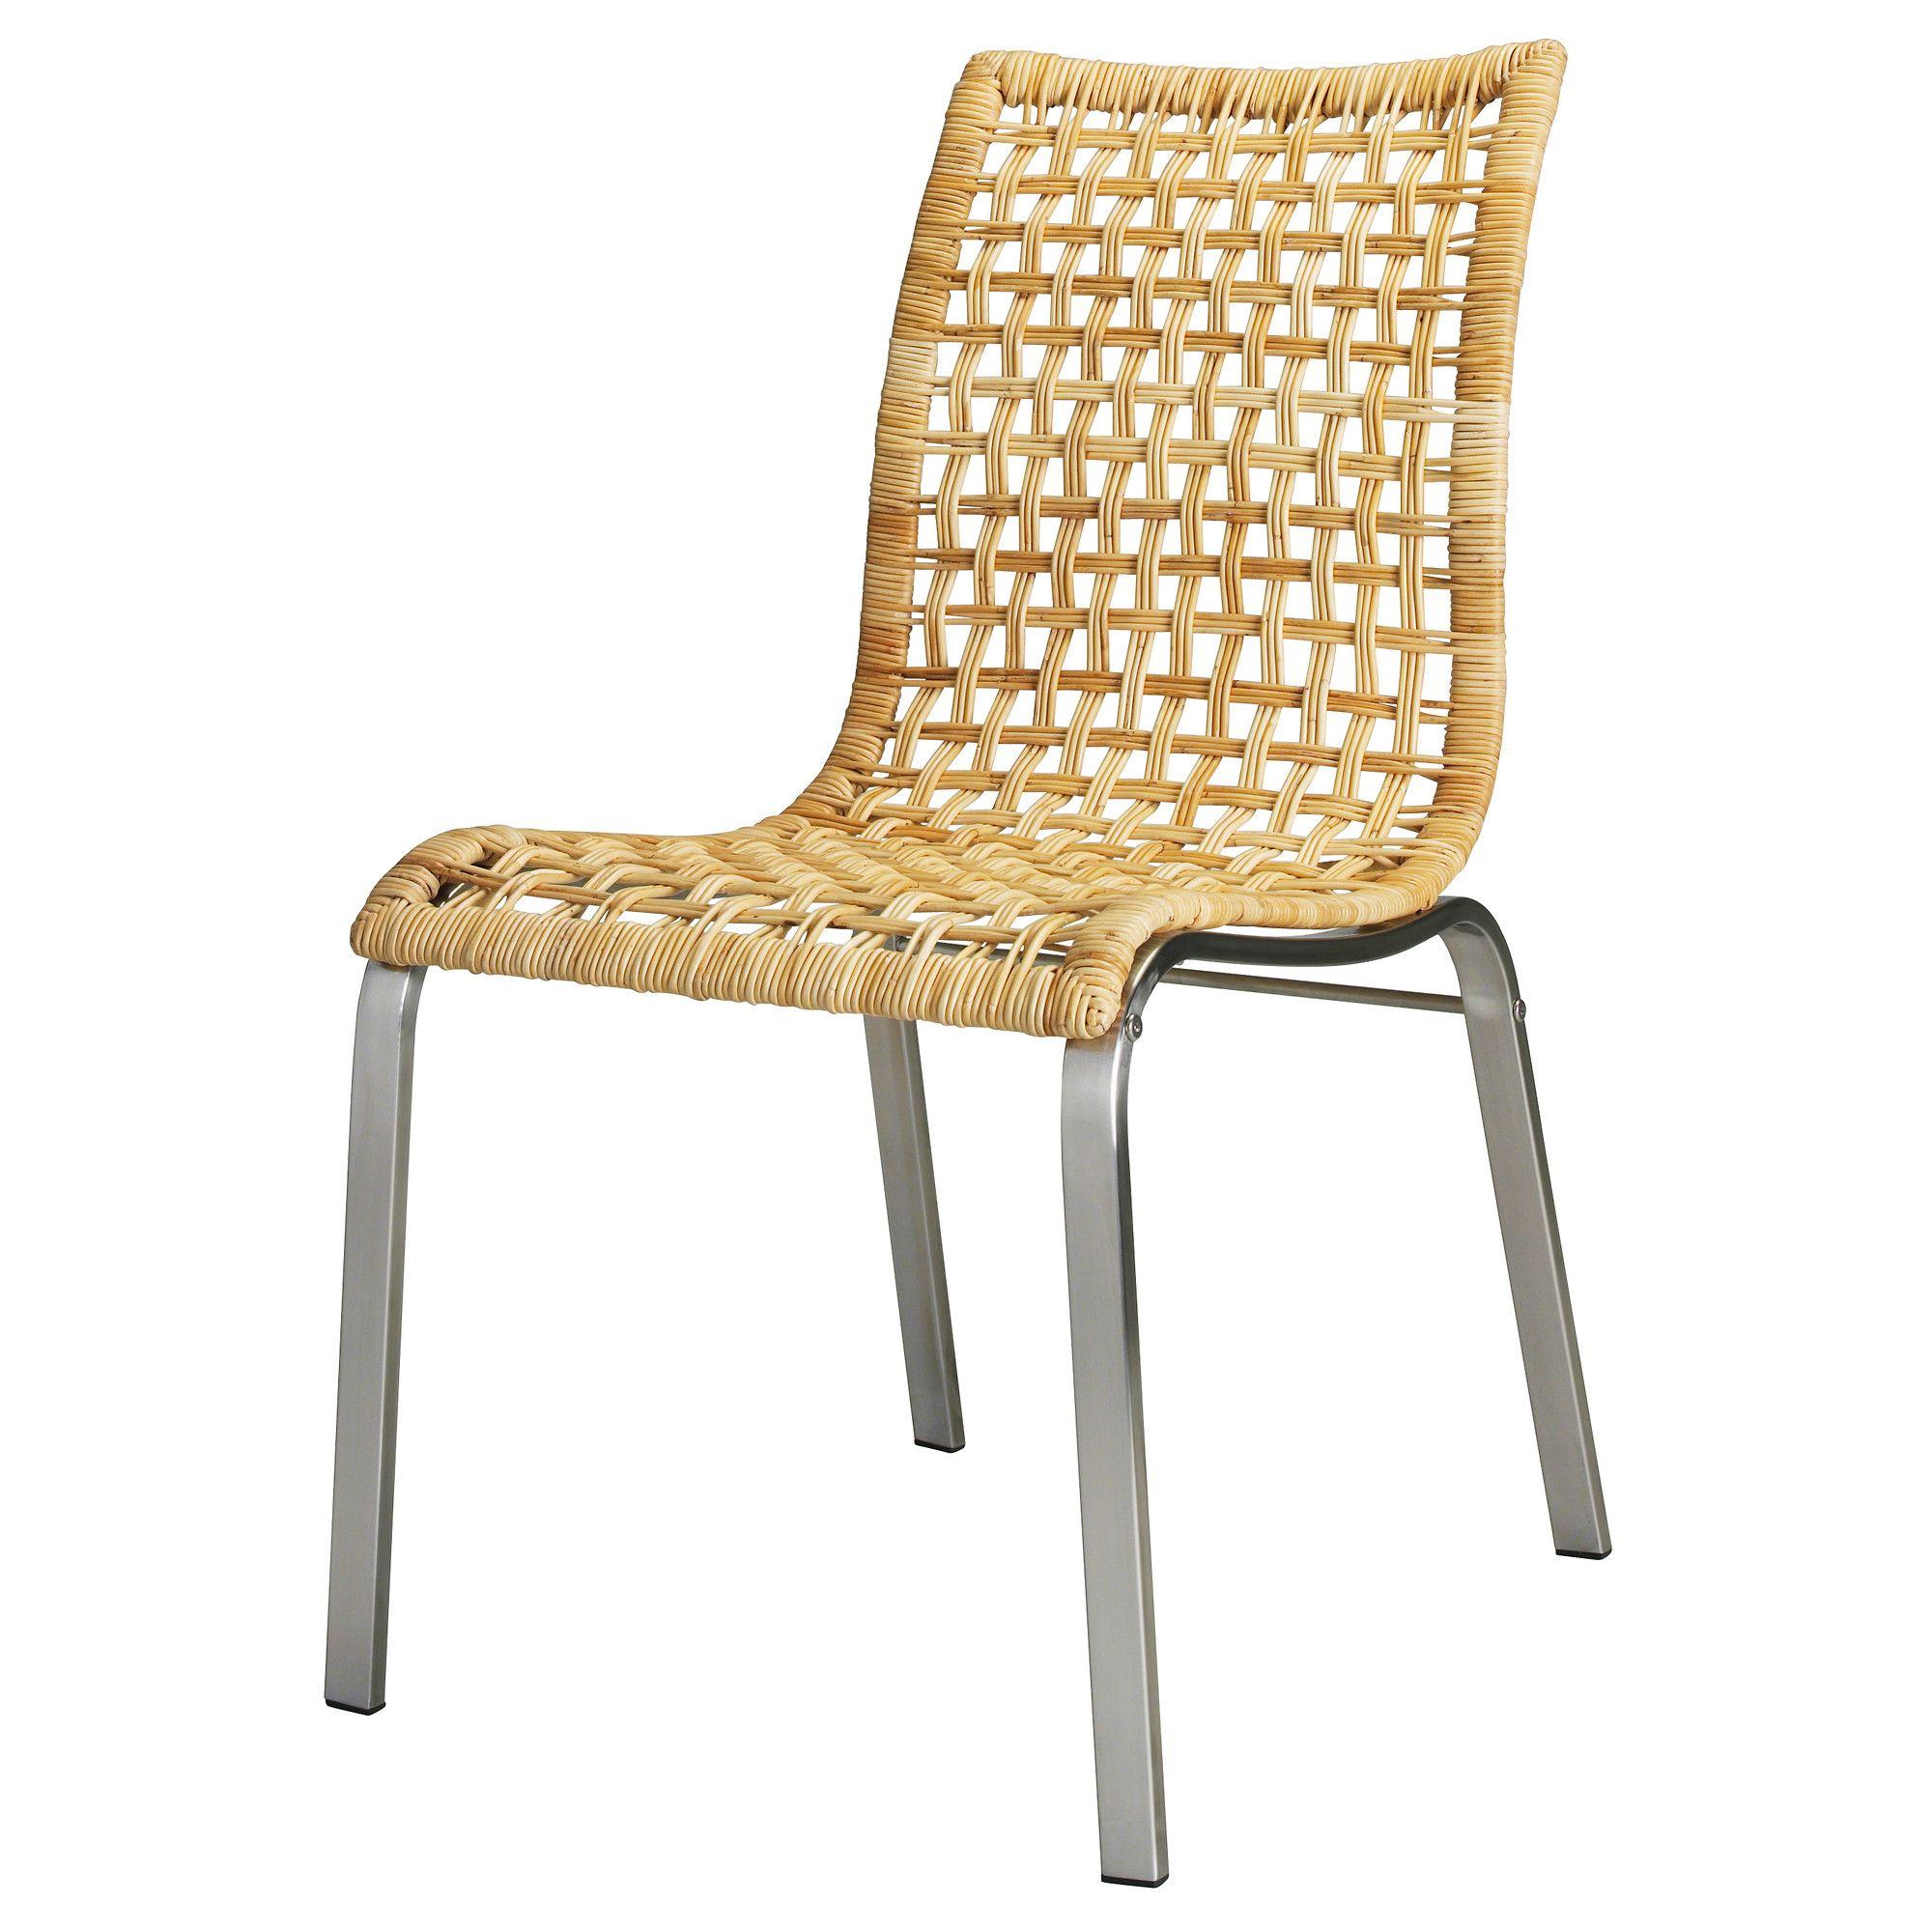 Ikea Us Furniture And Home Furnishings Ikea Dining Chair Ikea Dining Dining Chairs